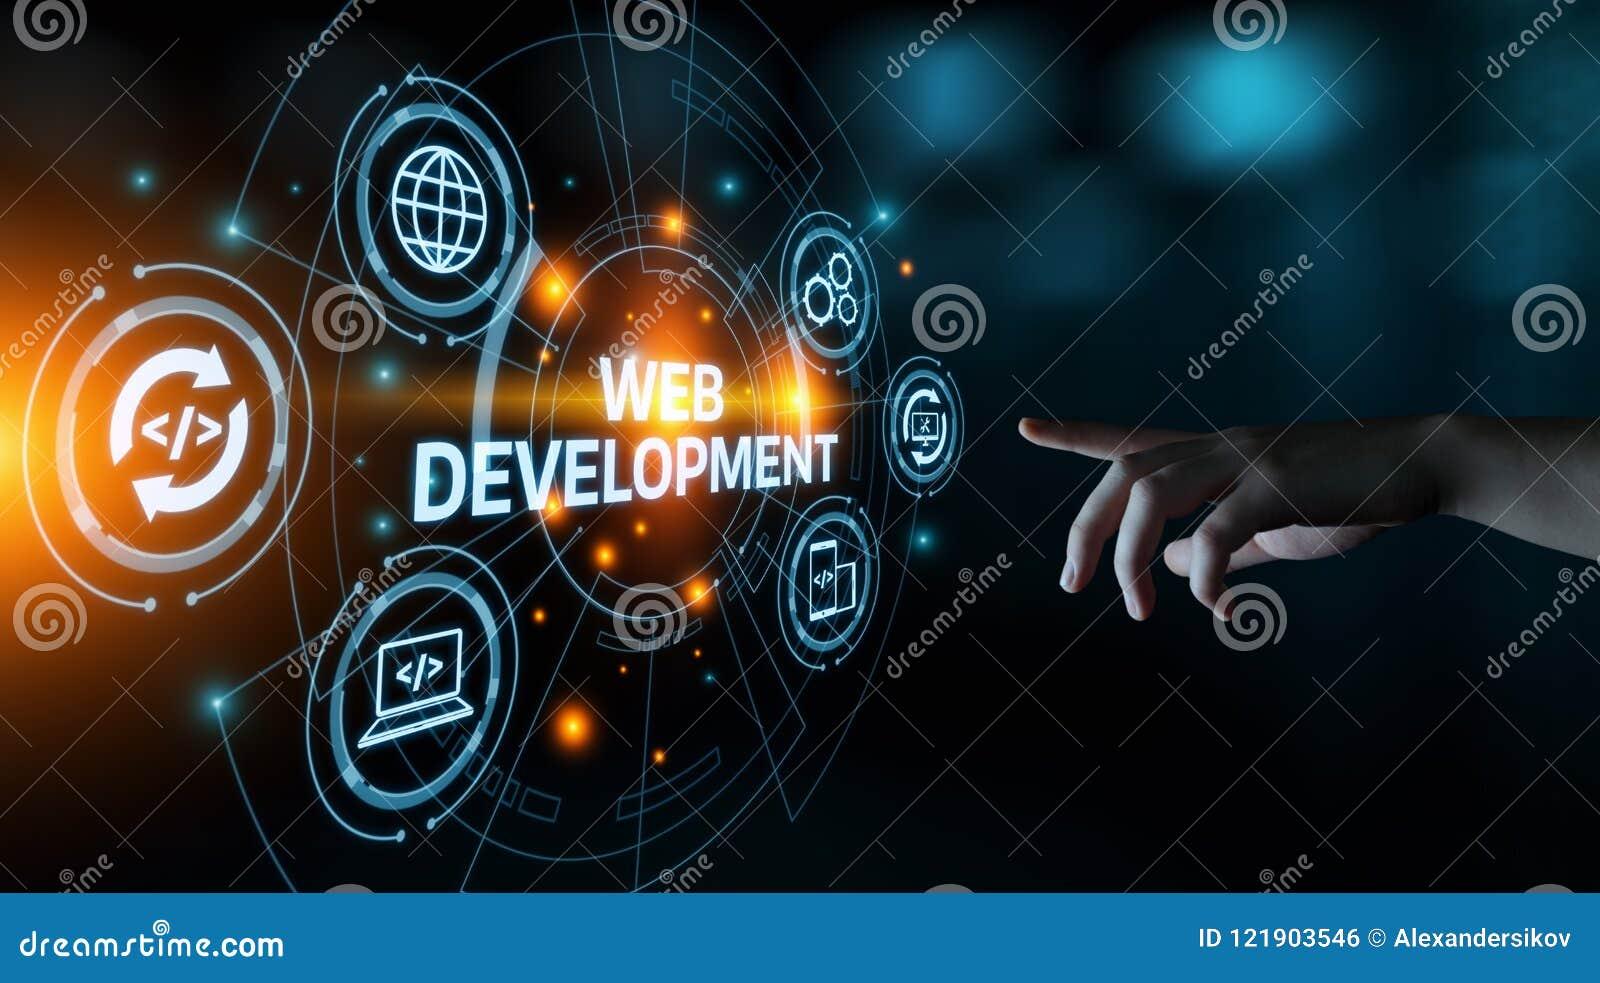 Web-Entwicklungs-Kodierungs-Programmierungsinternet-Technologie-Geschäftskonzept